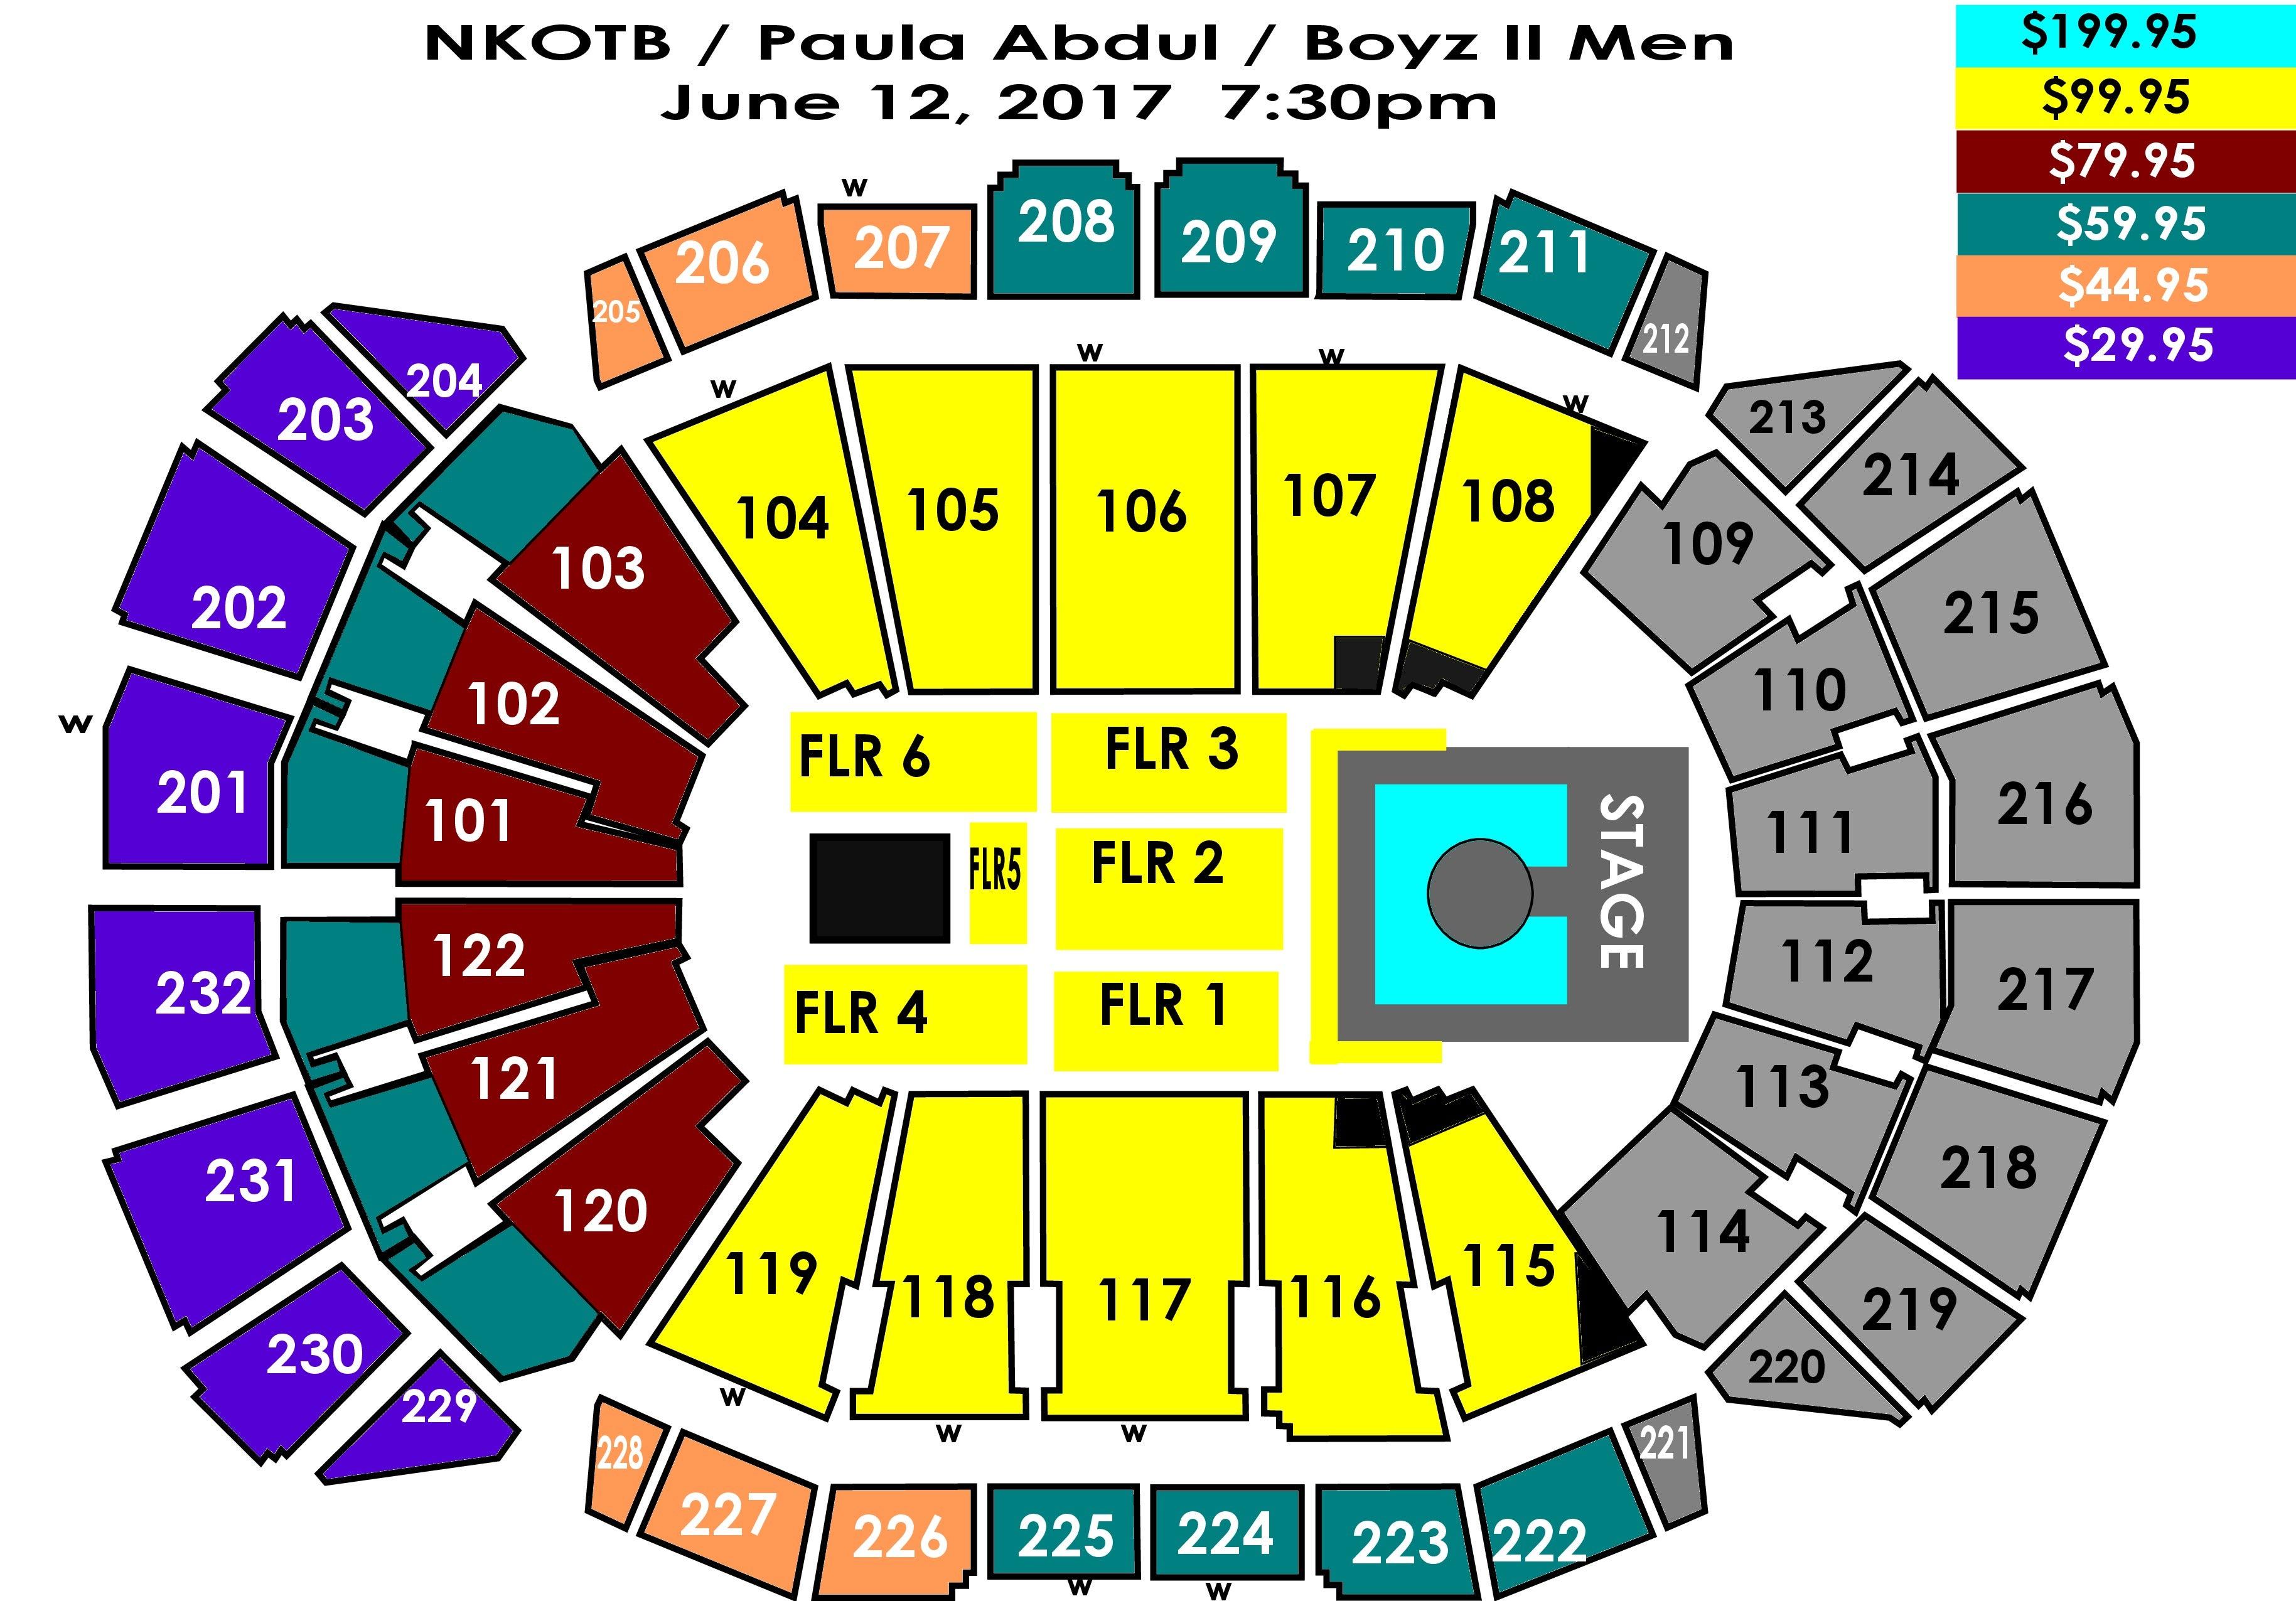 Sprint center seating chart carnaval jmsmusic co